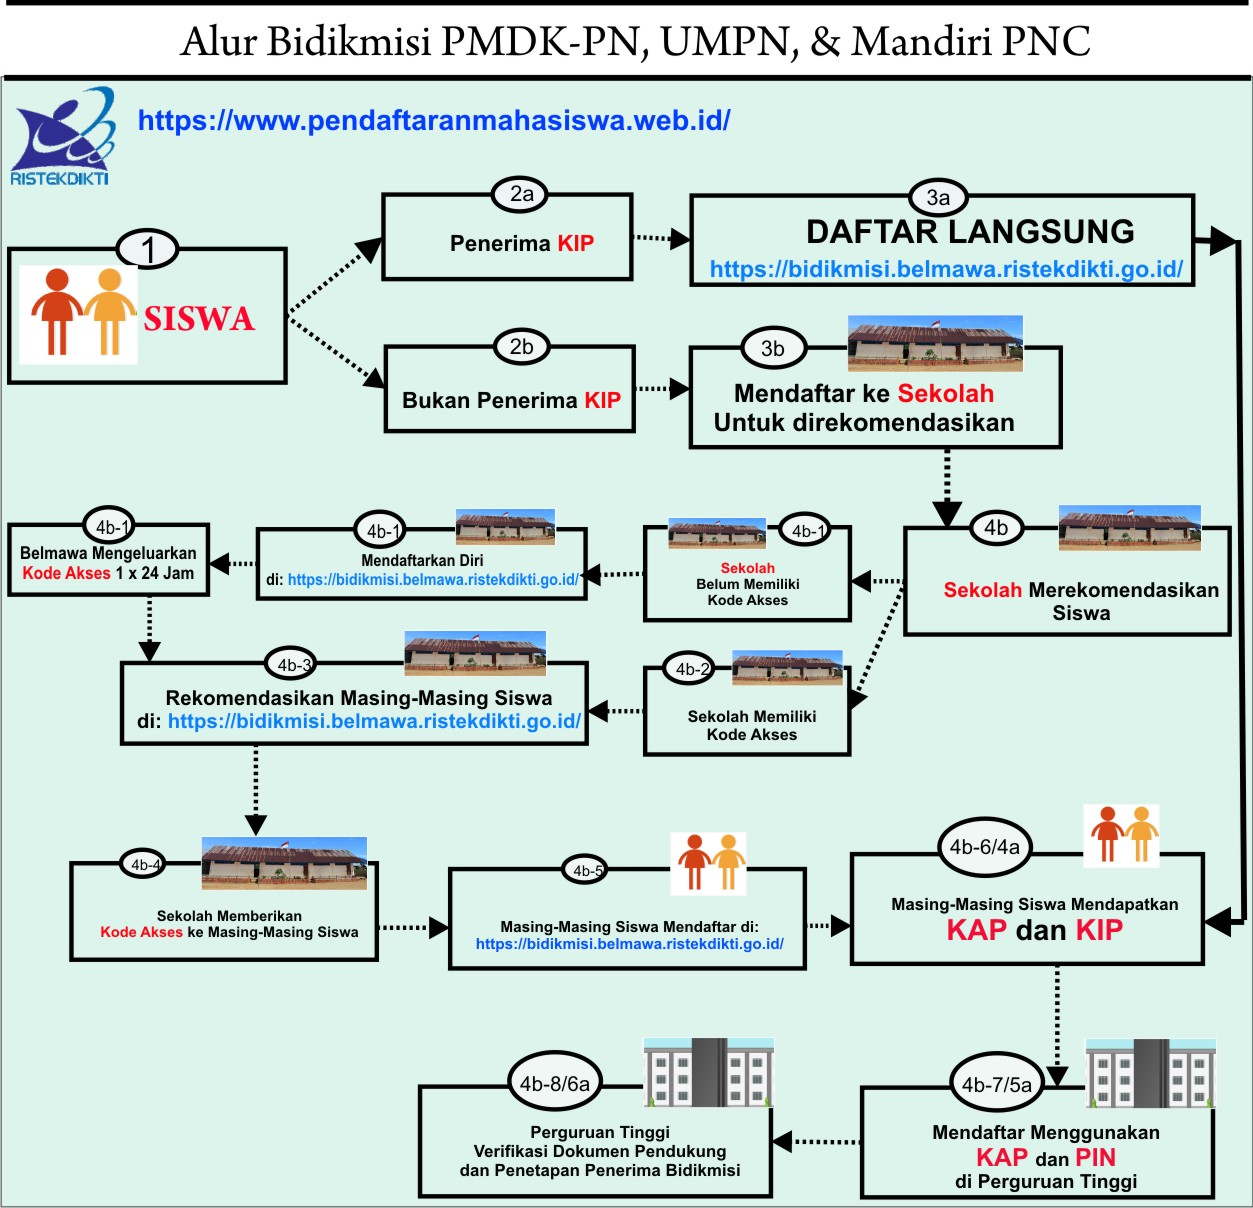 Gambar Alur Pendaftaran Bidikmisi JalurPMDK-PN,UMPN,Mandiri